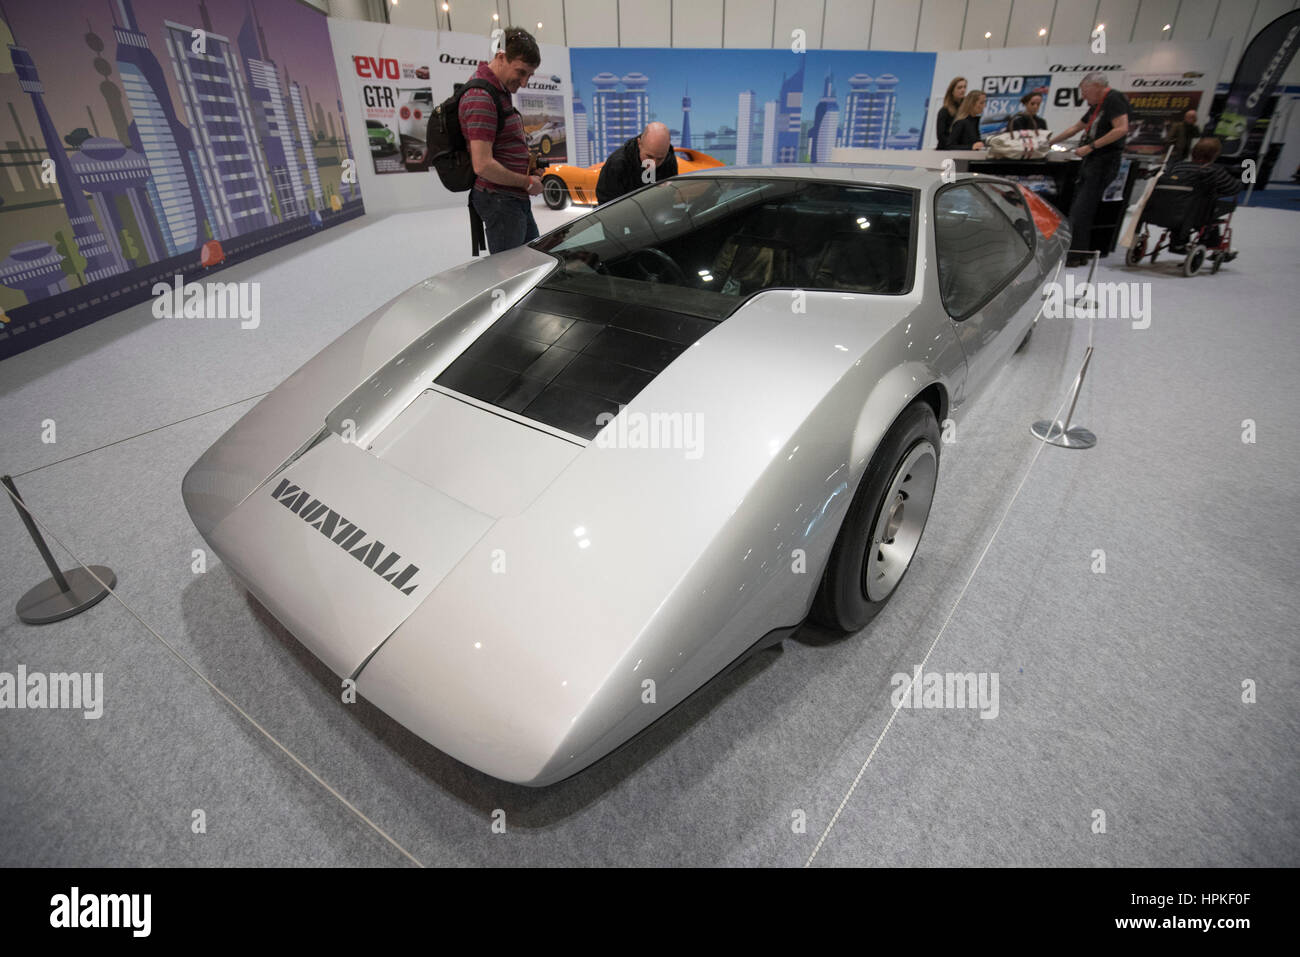 london, uk. 23. februar 2017. 1970er jahren prototyp vauxhall